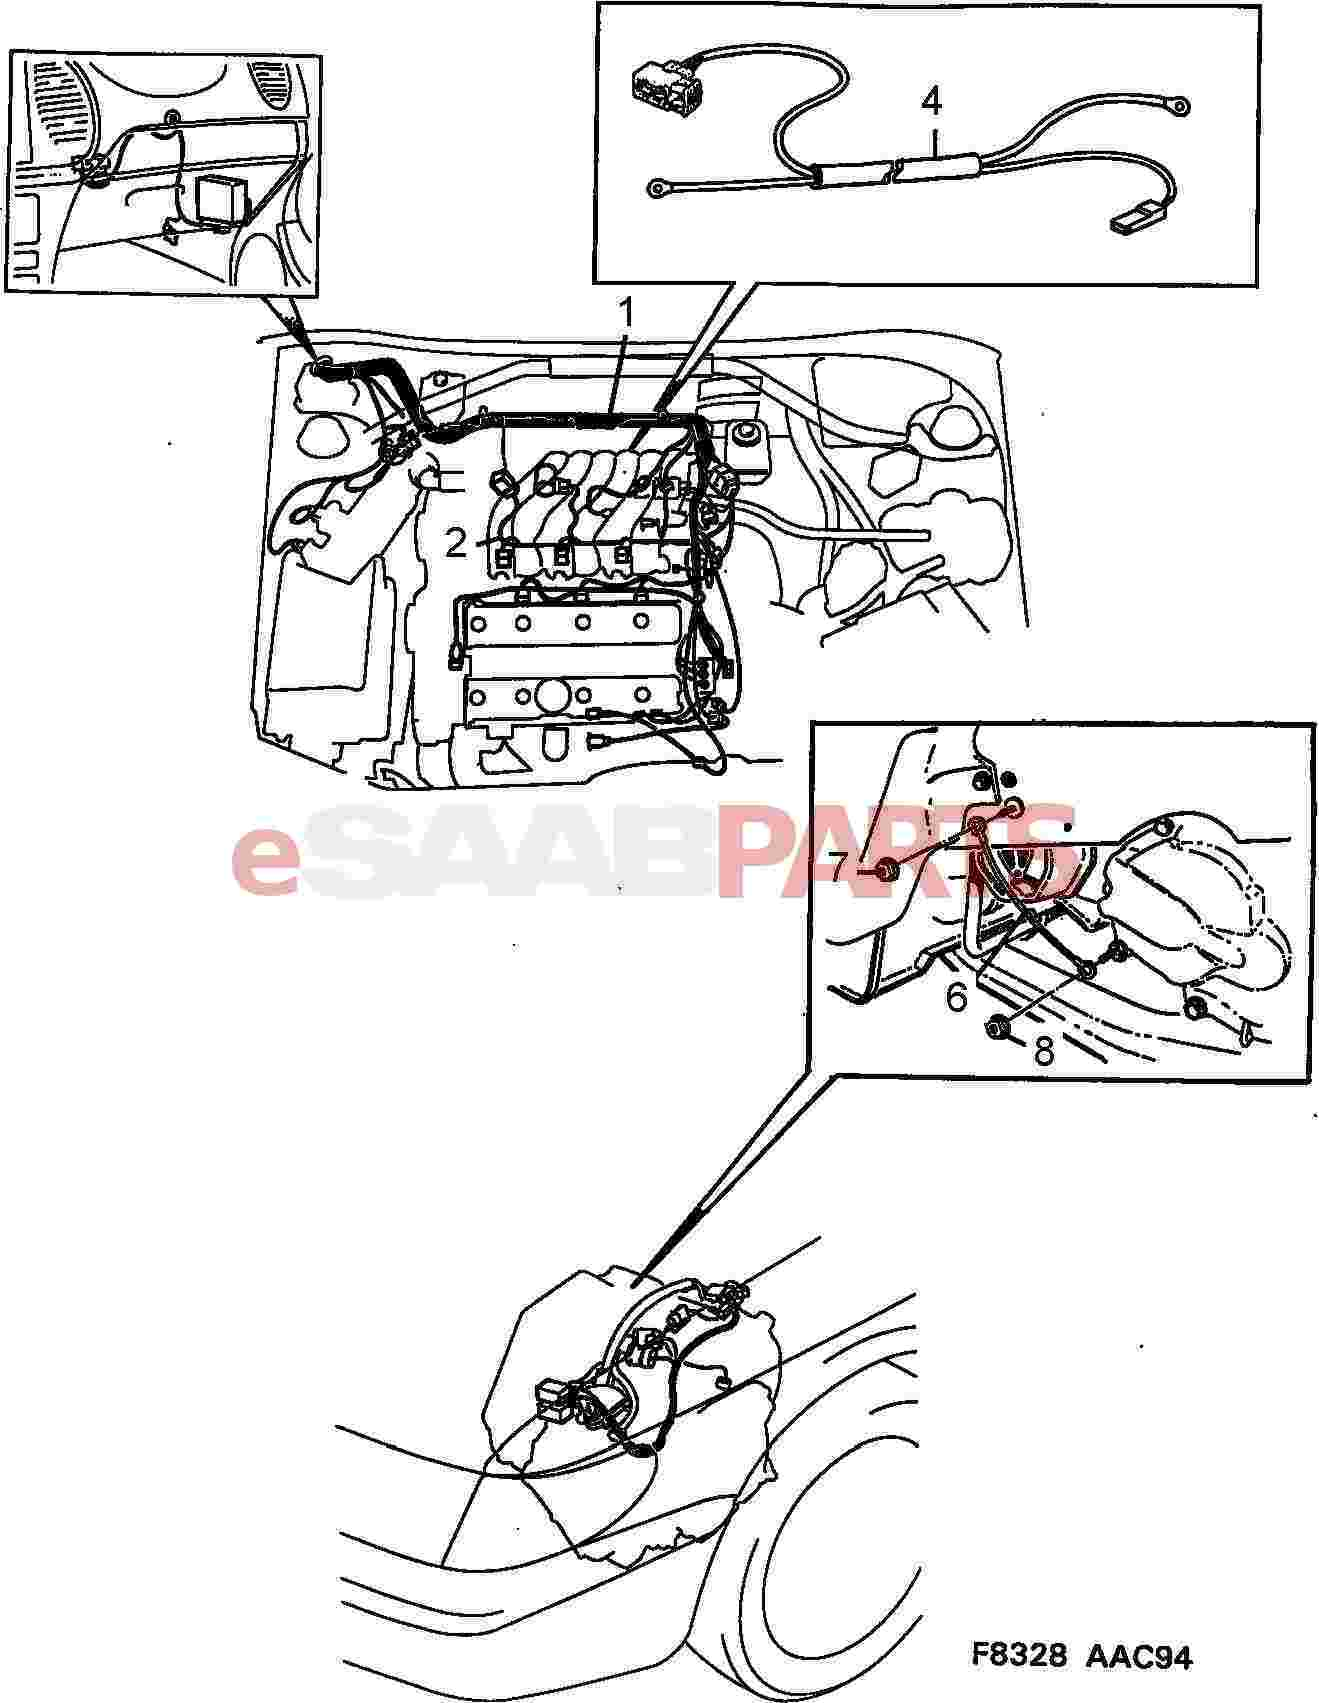 saab 900 transmission part diagram